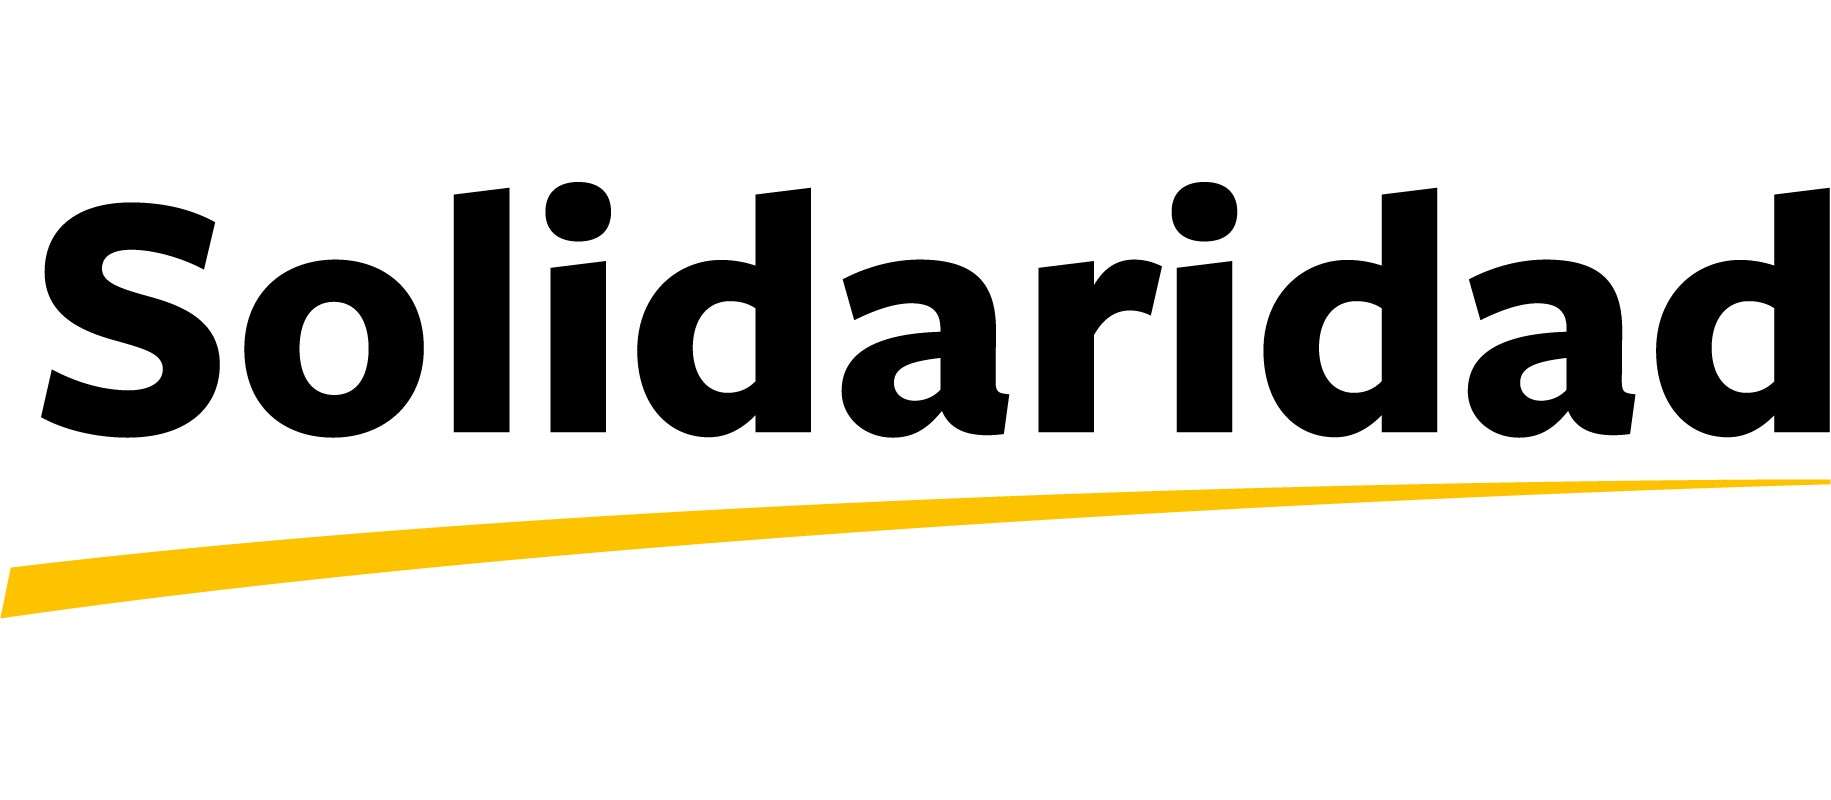 SOLIDARIDAD'S NICO ROOZEN HAS FRANK COMMENTS ON CHILD SLAVERY